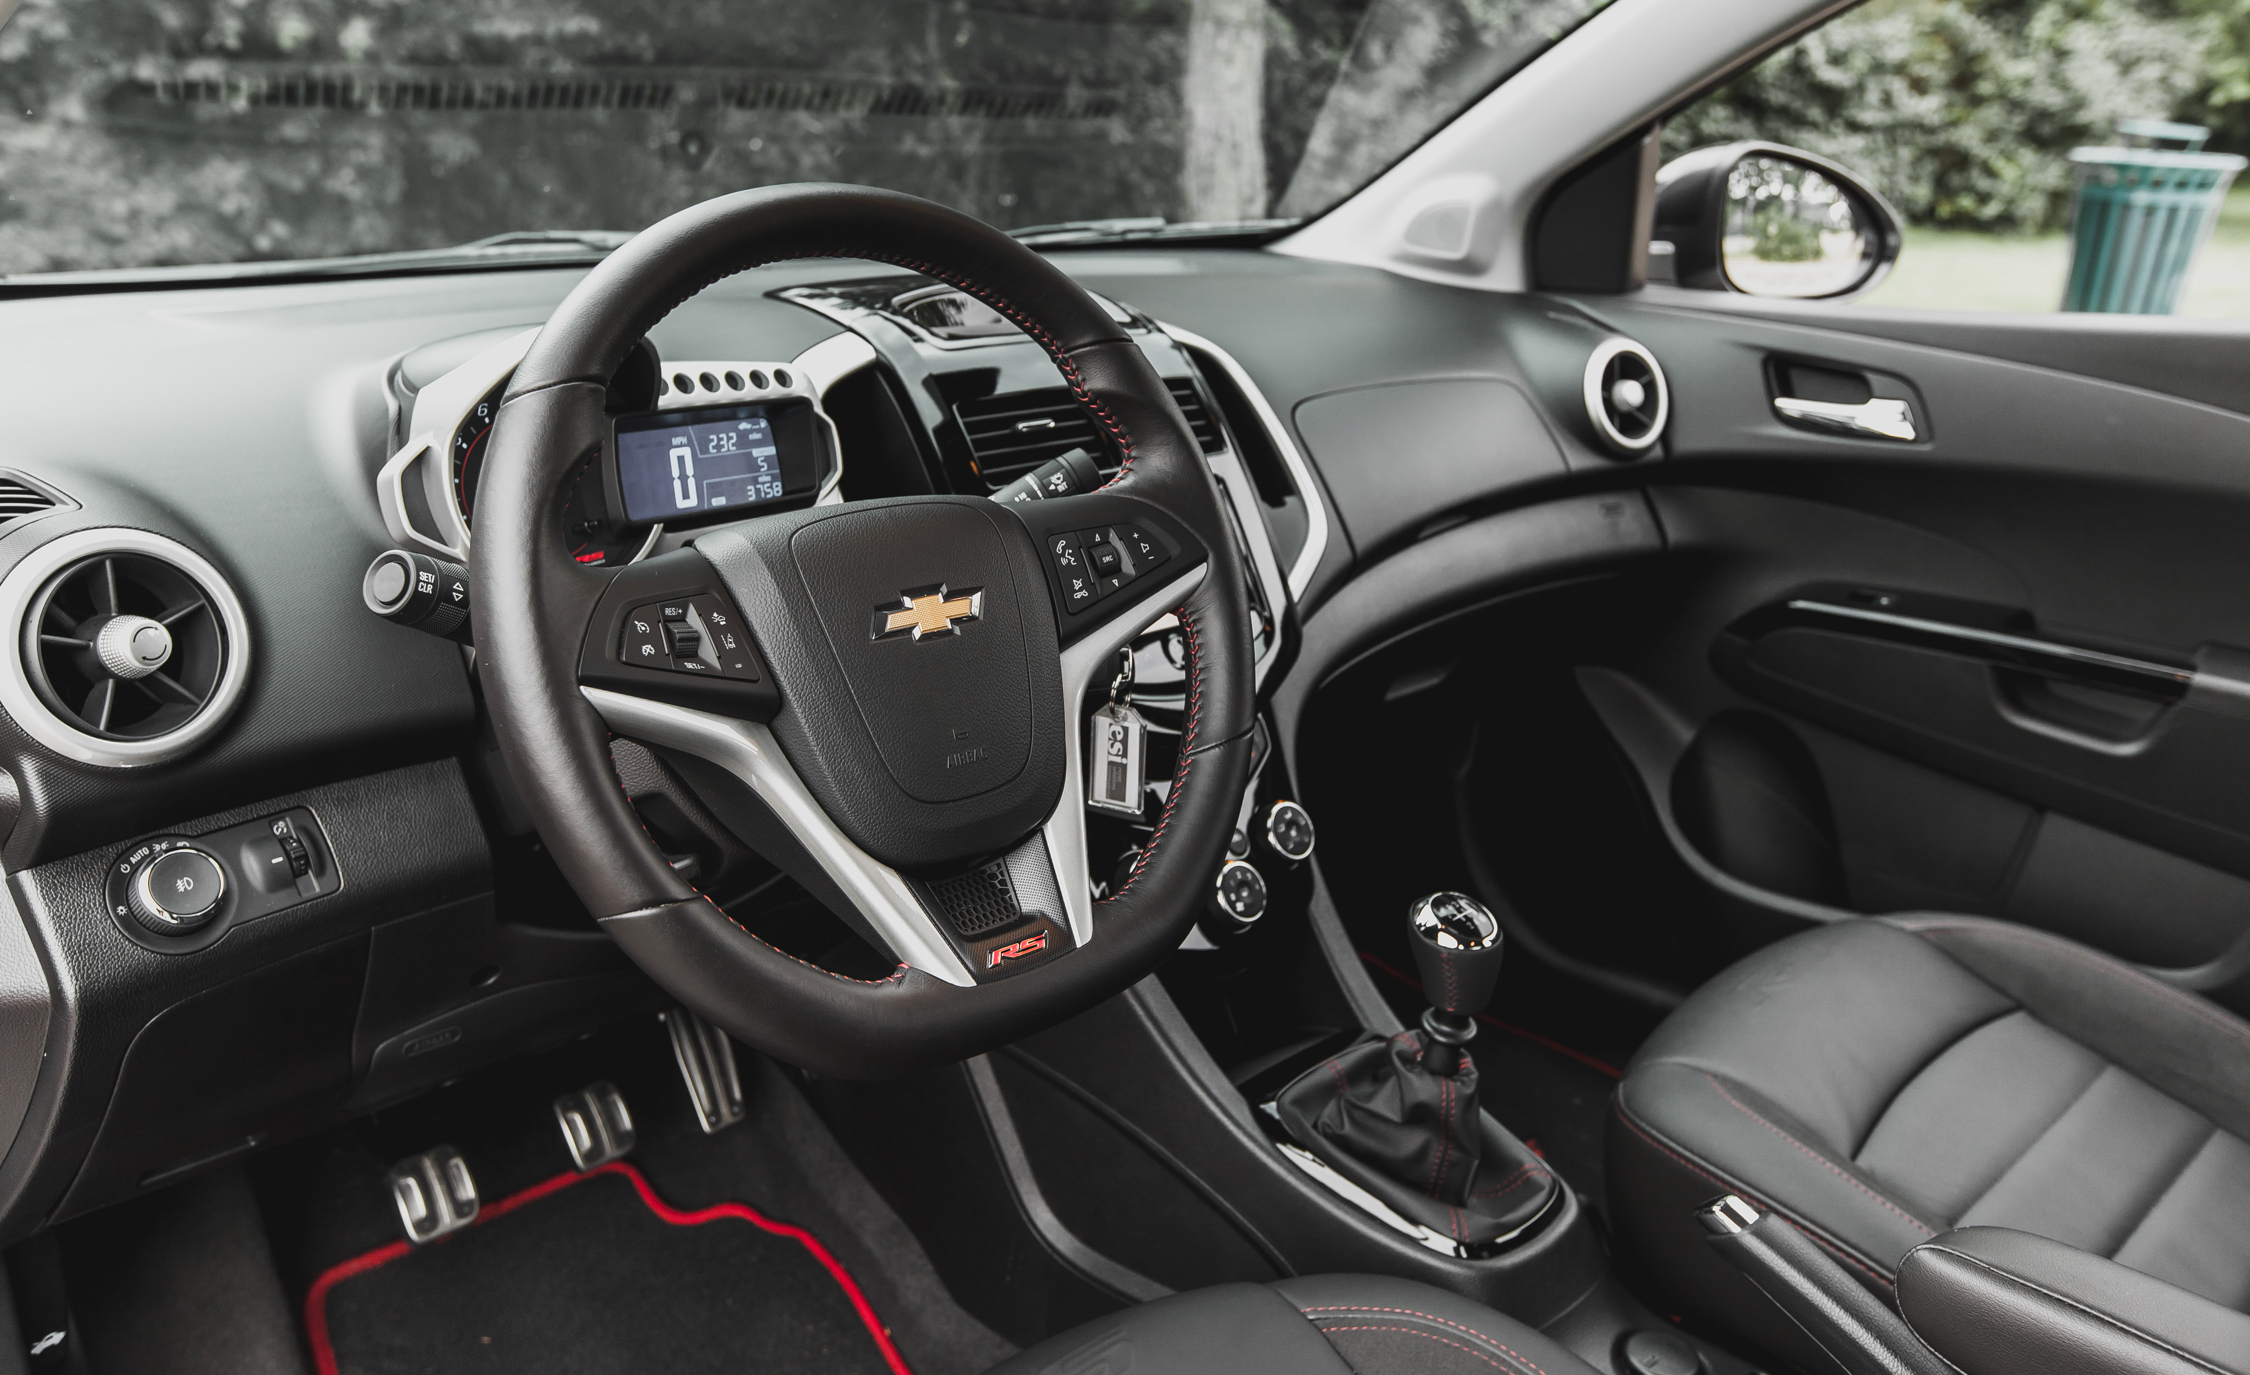 2014 Chevrolet Sonic RS Sedan Interior (View 11 of 27)